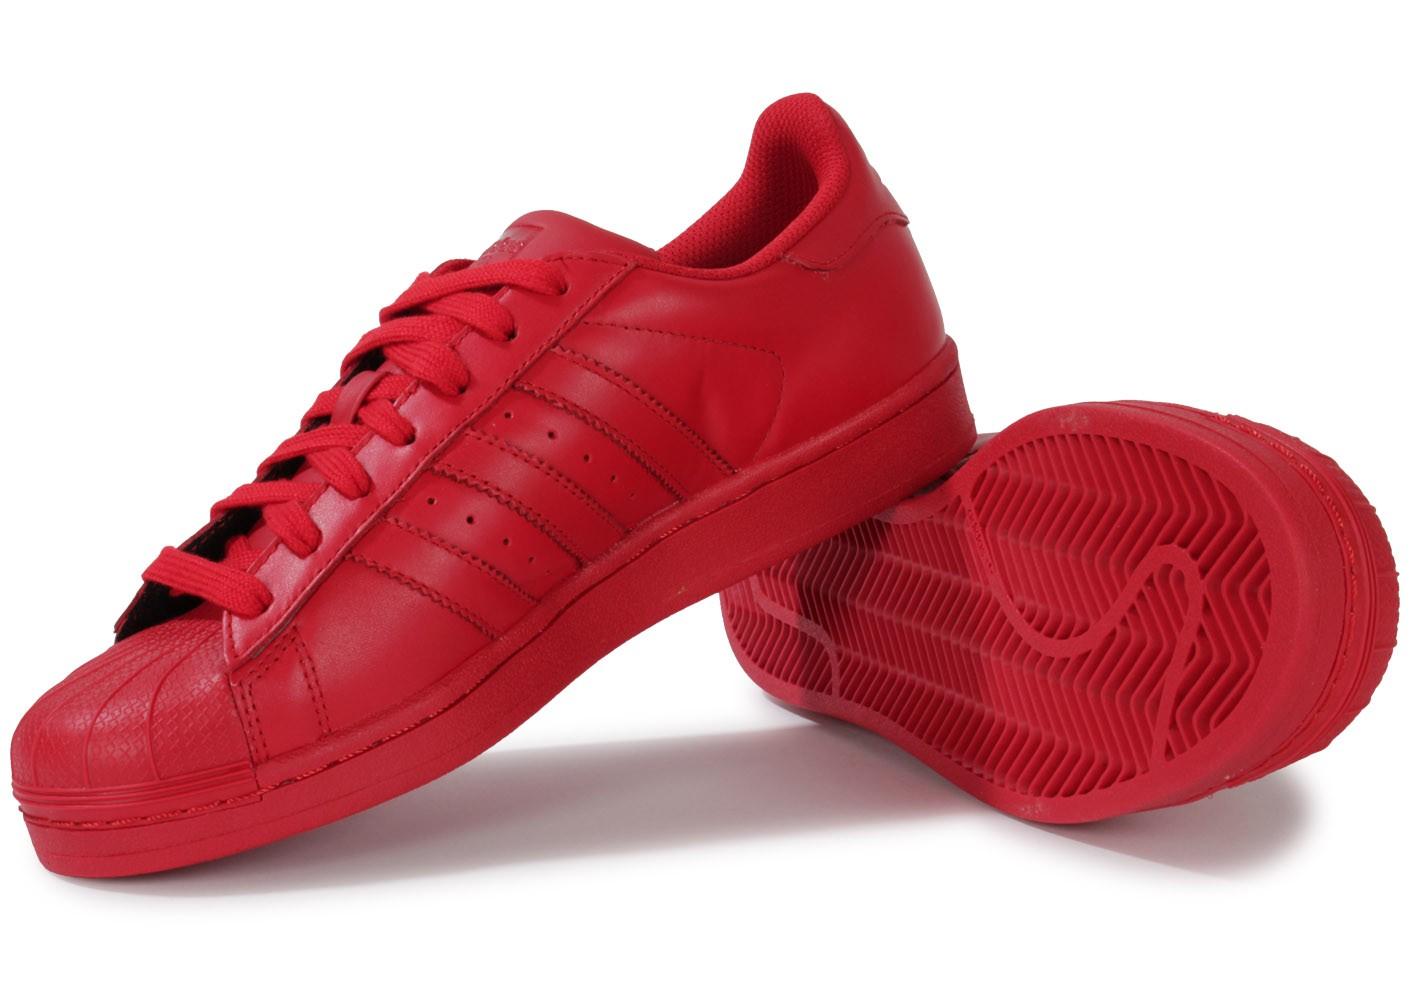 adidas superstar toe adidas superstar daim rouge achat